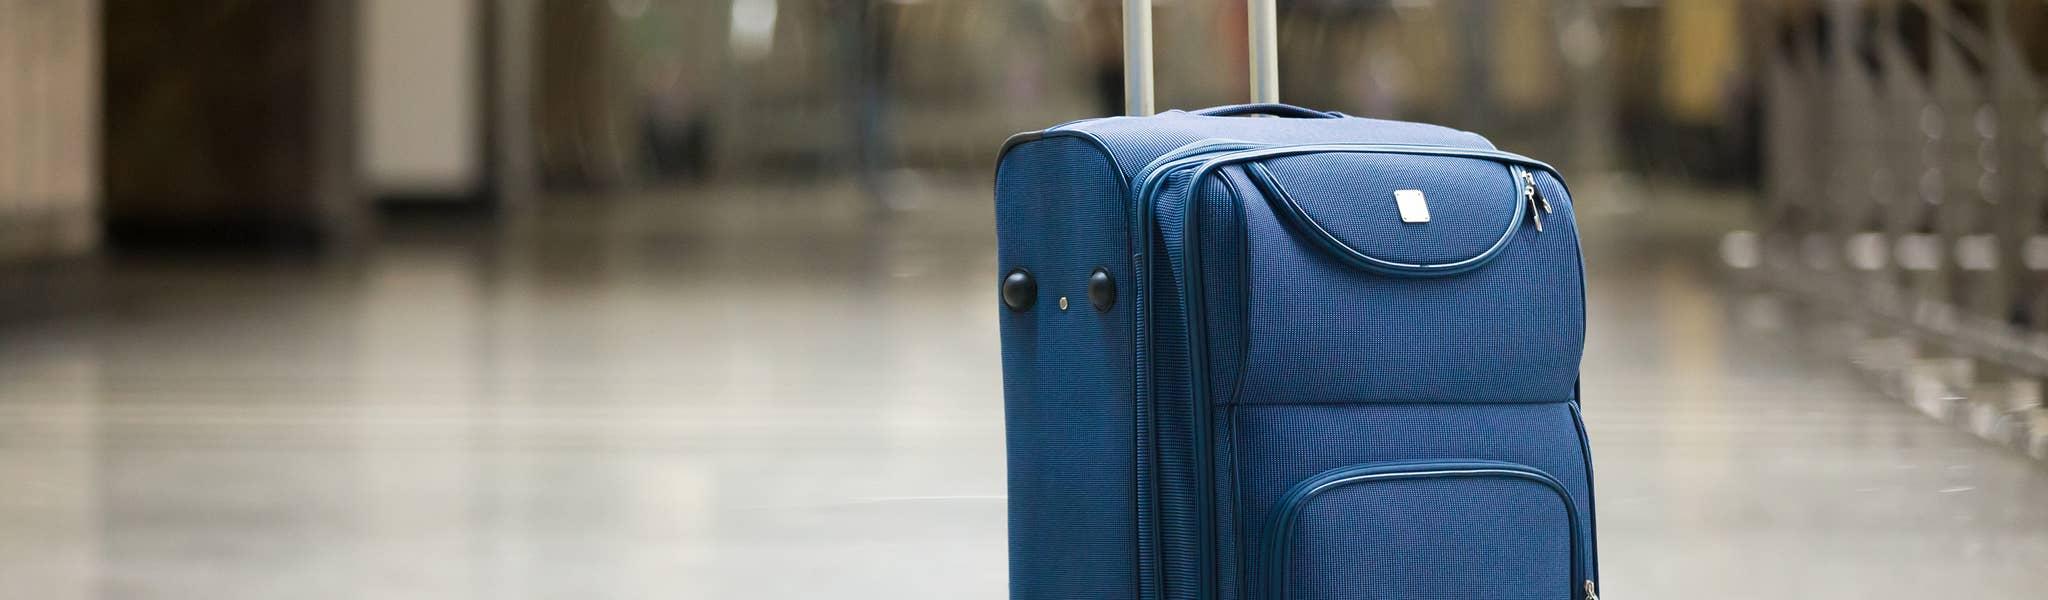 DelayedMissing Baggage Aer Lingus